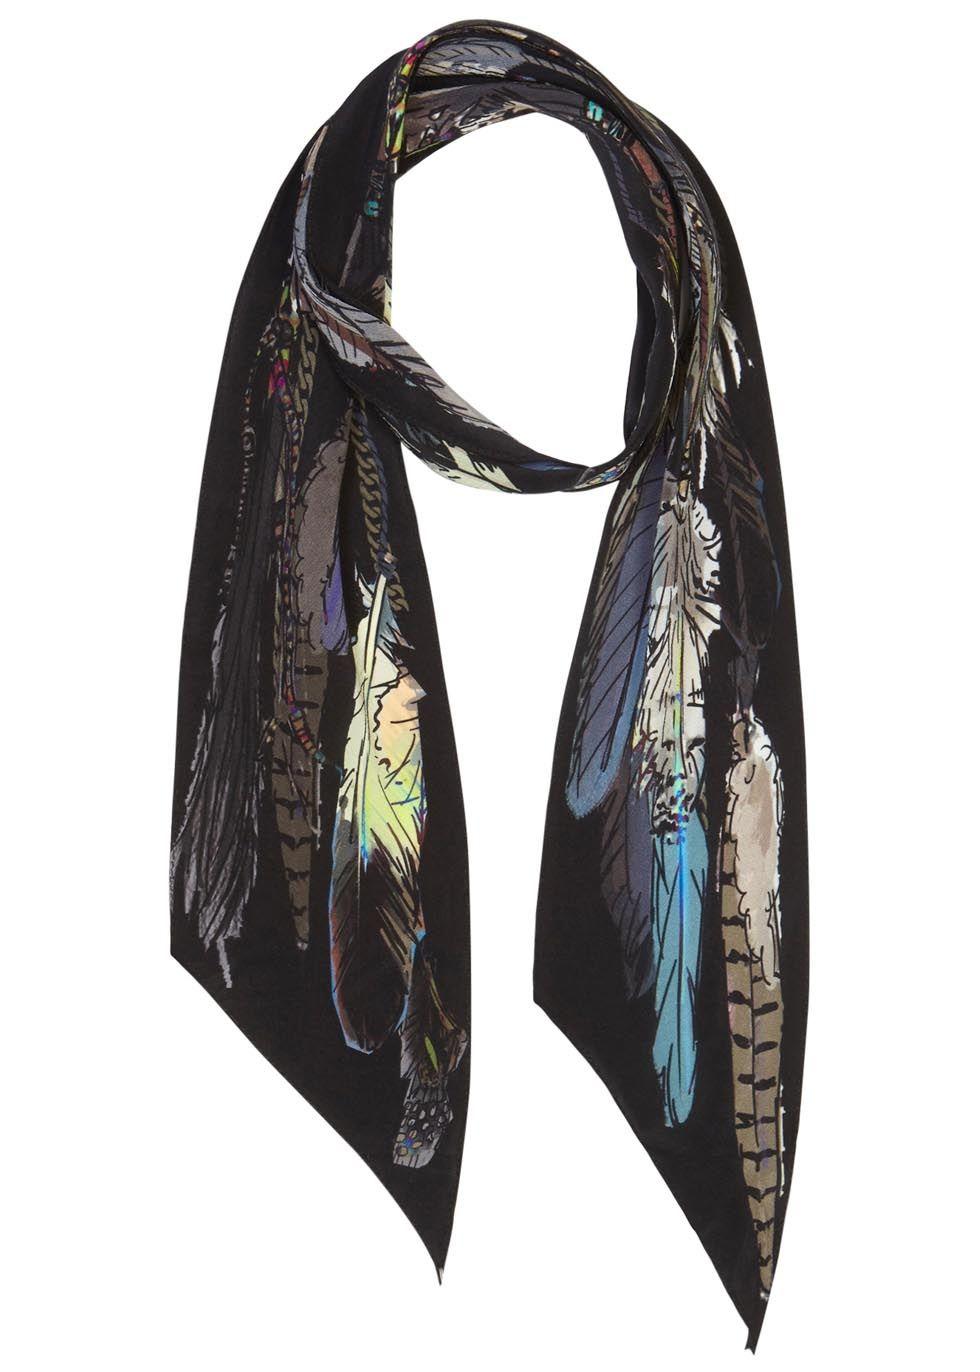 ROCKINS multicoloured silk georgette scarf Printed Presented in a designer-stamped box 100% silk